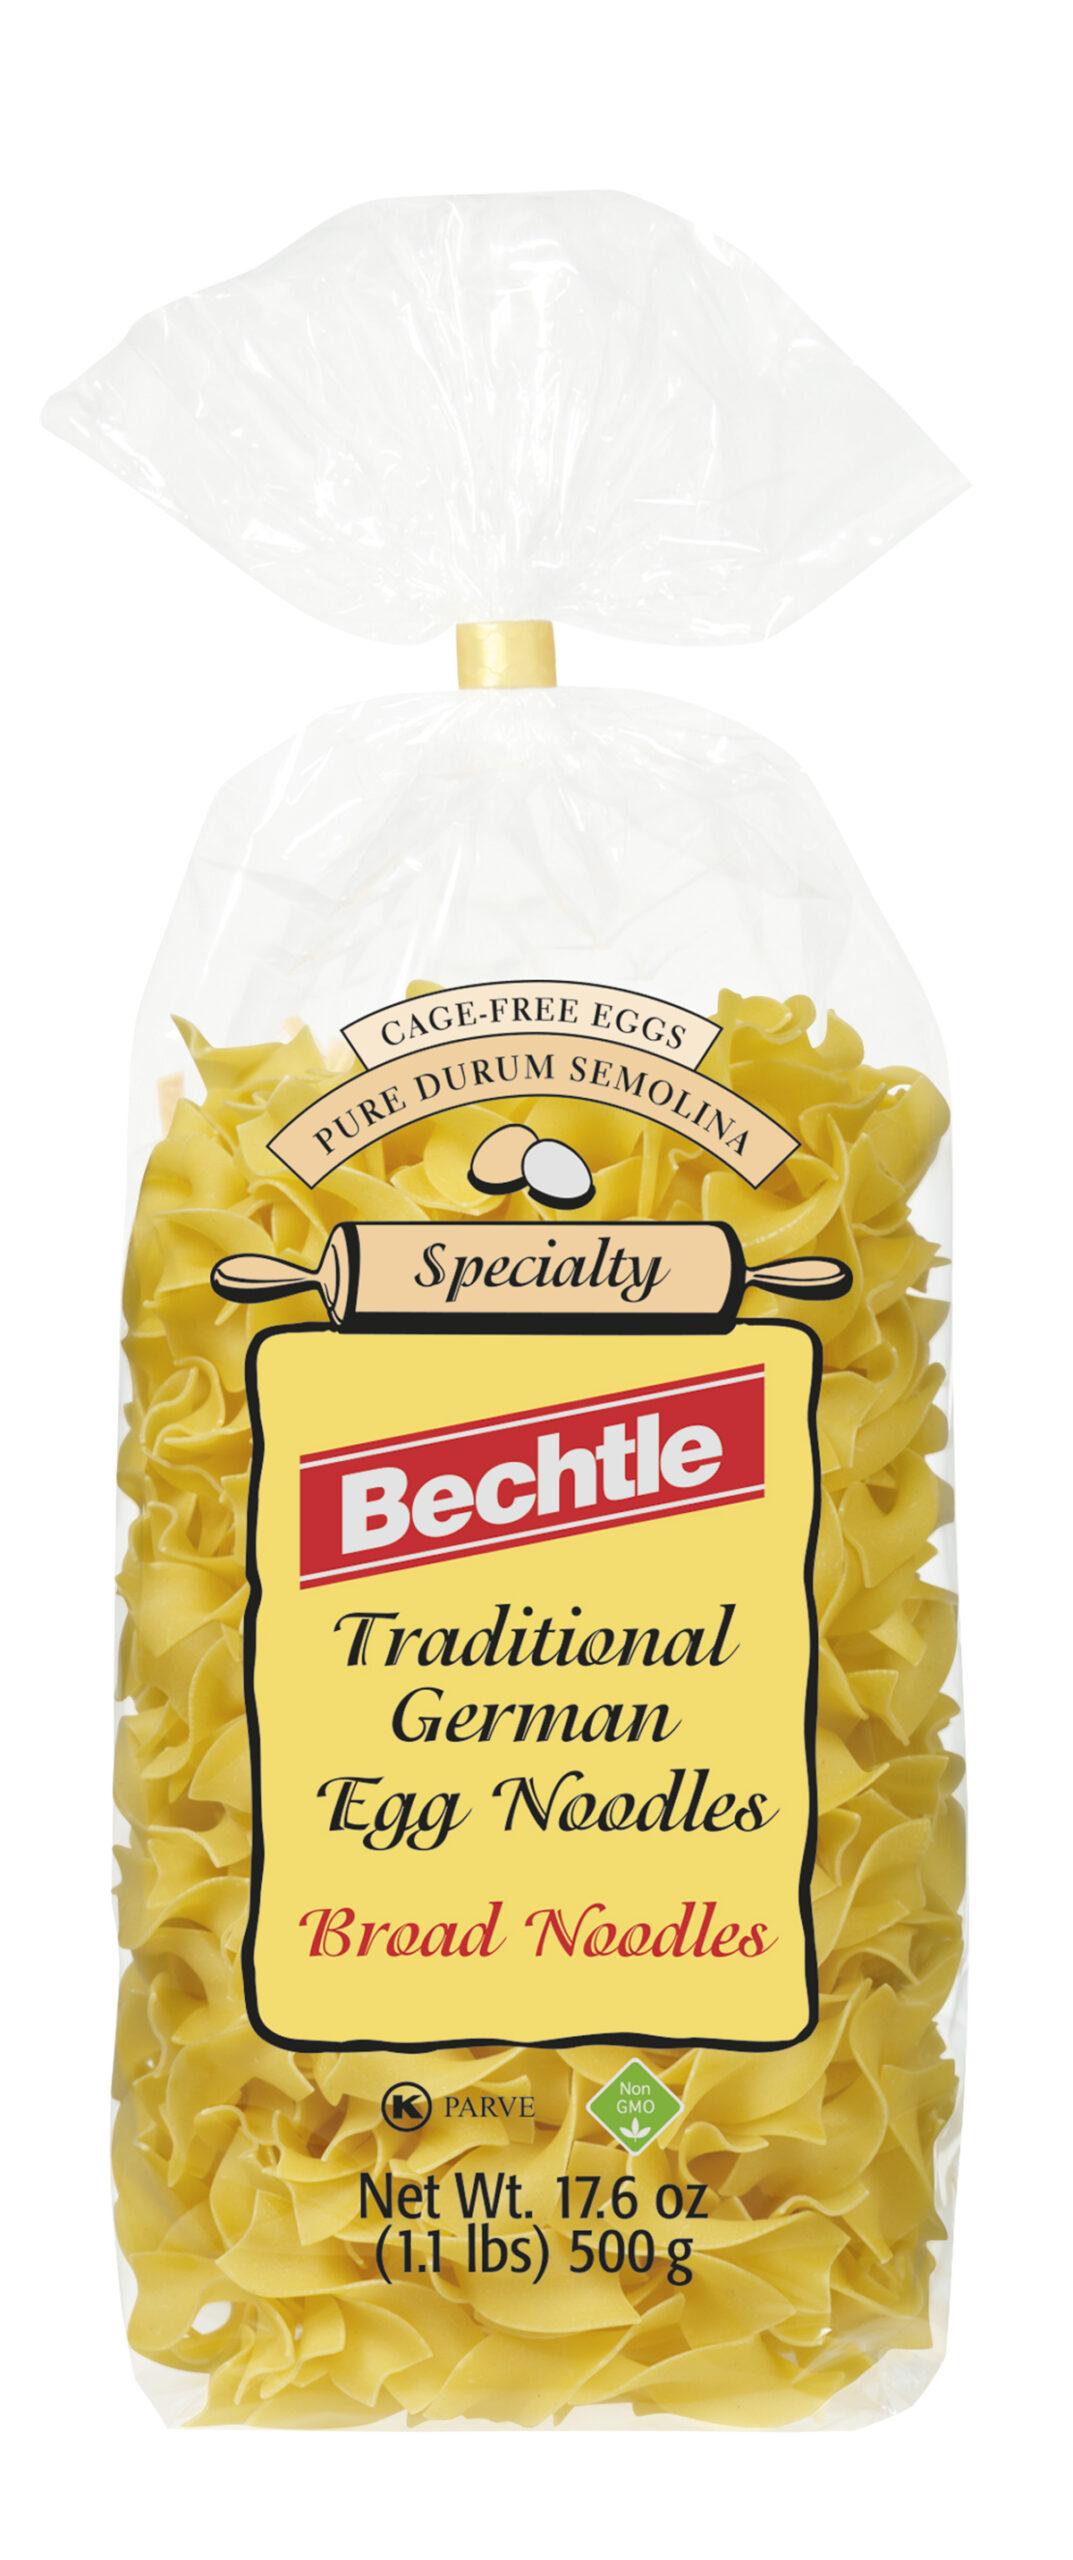 Bechtle Broad Noodles